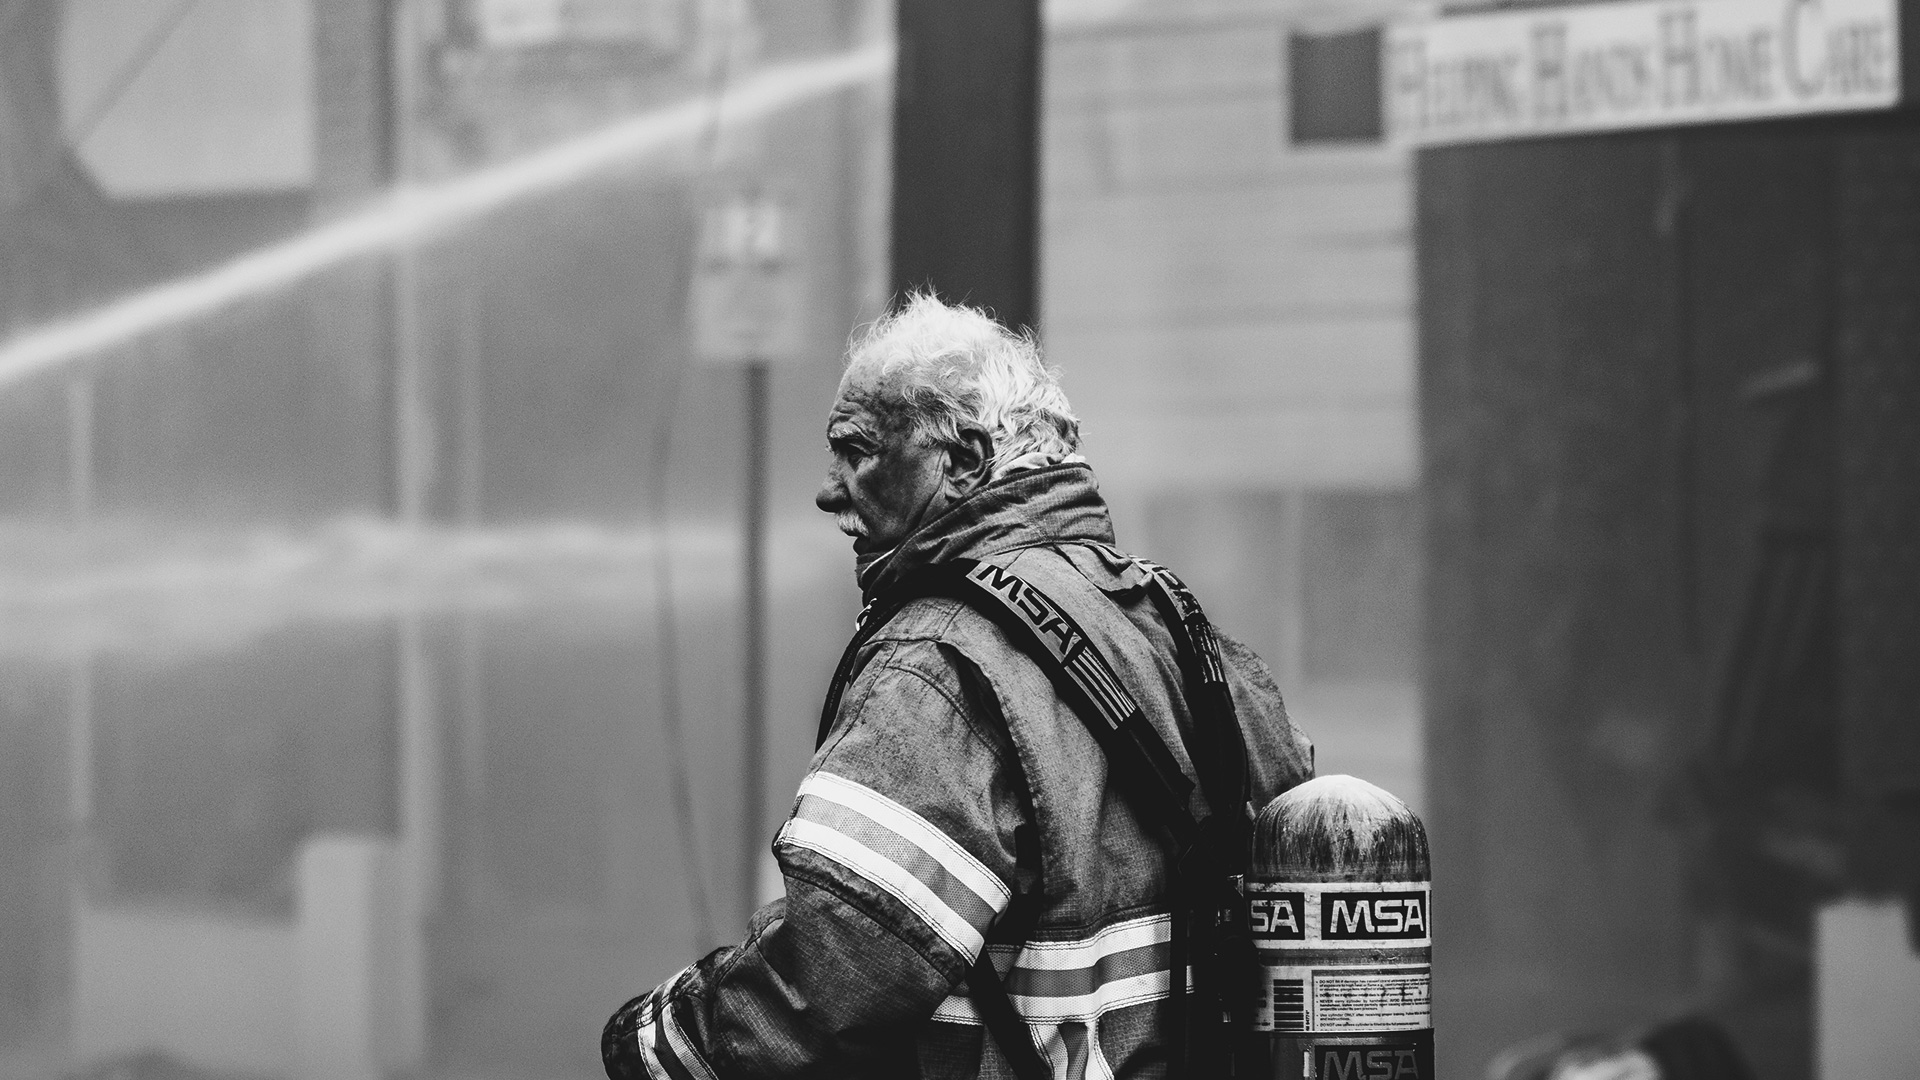 Robert Michaels | Serve and Protect | Steve Brown, Etc.